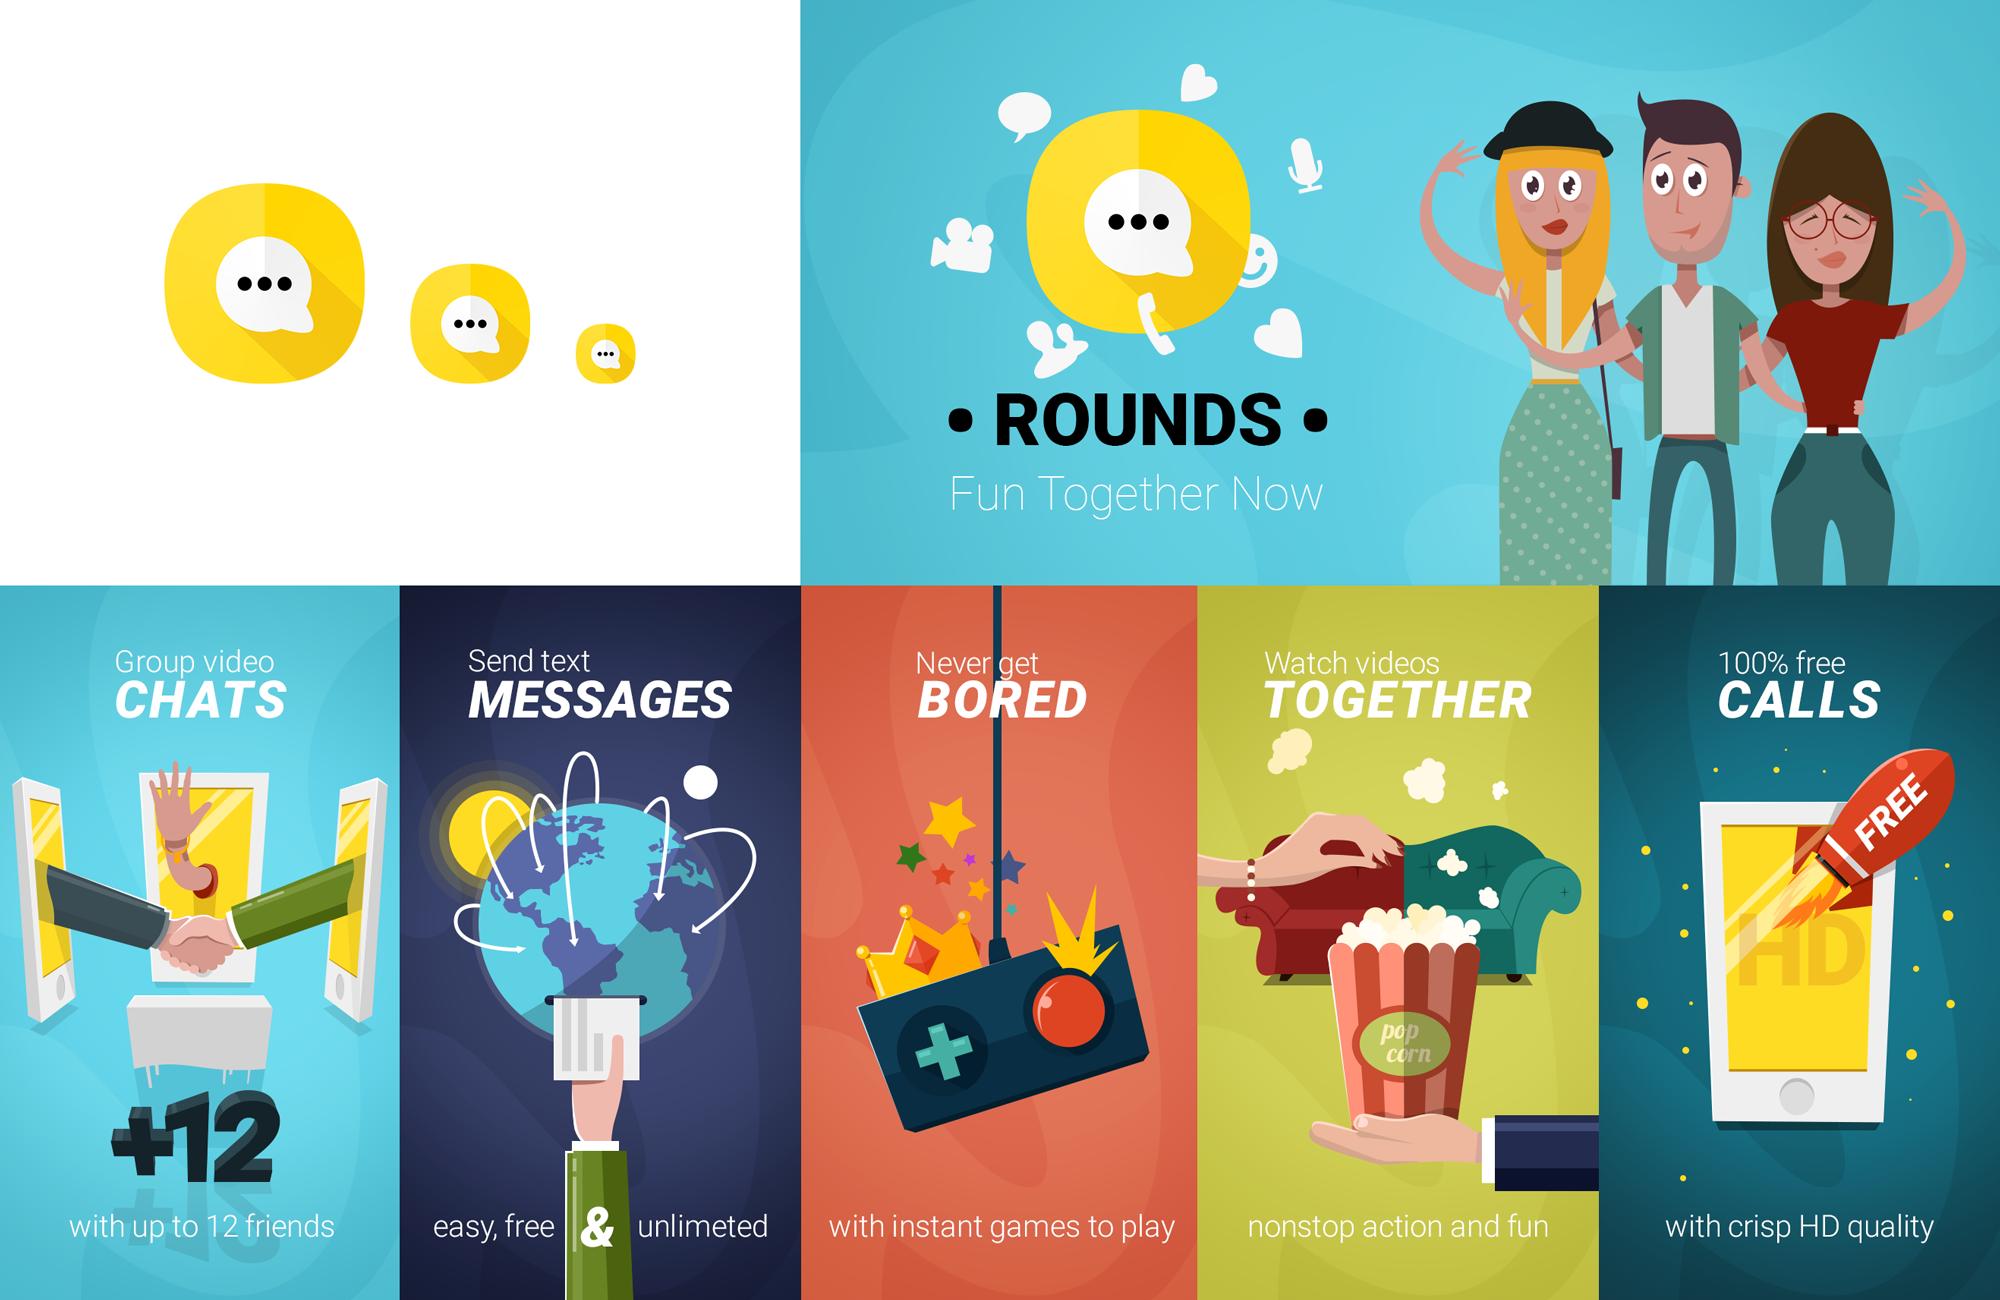 Illustrated app advertisement